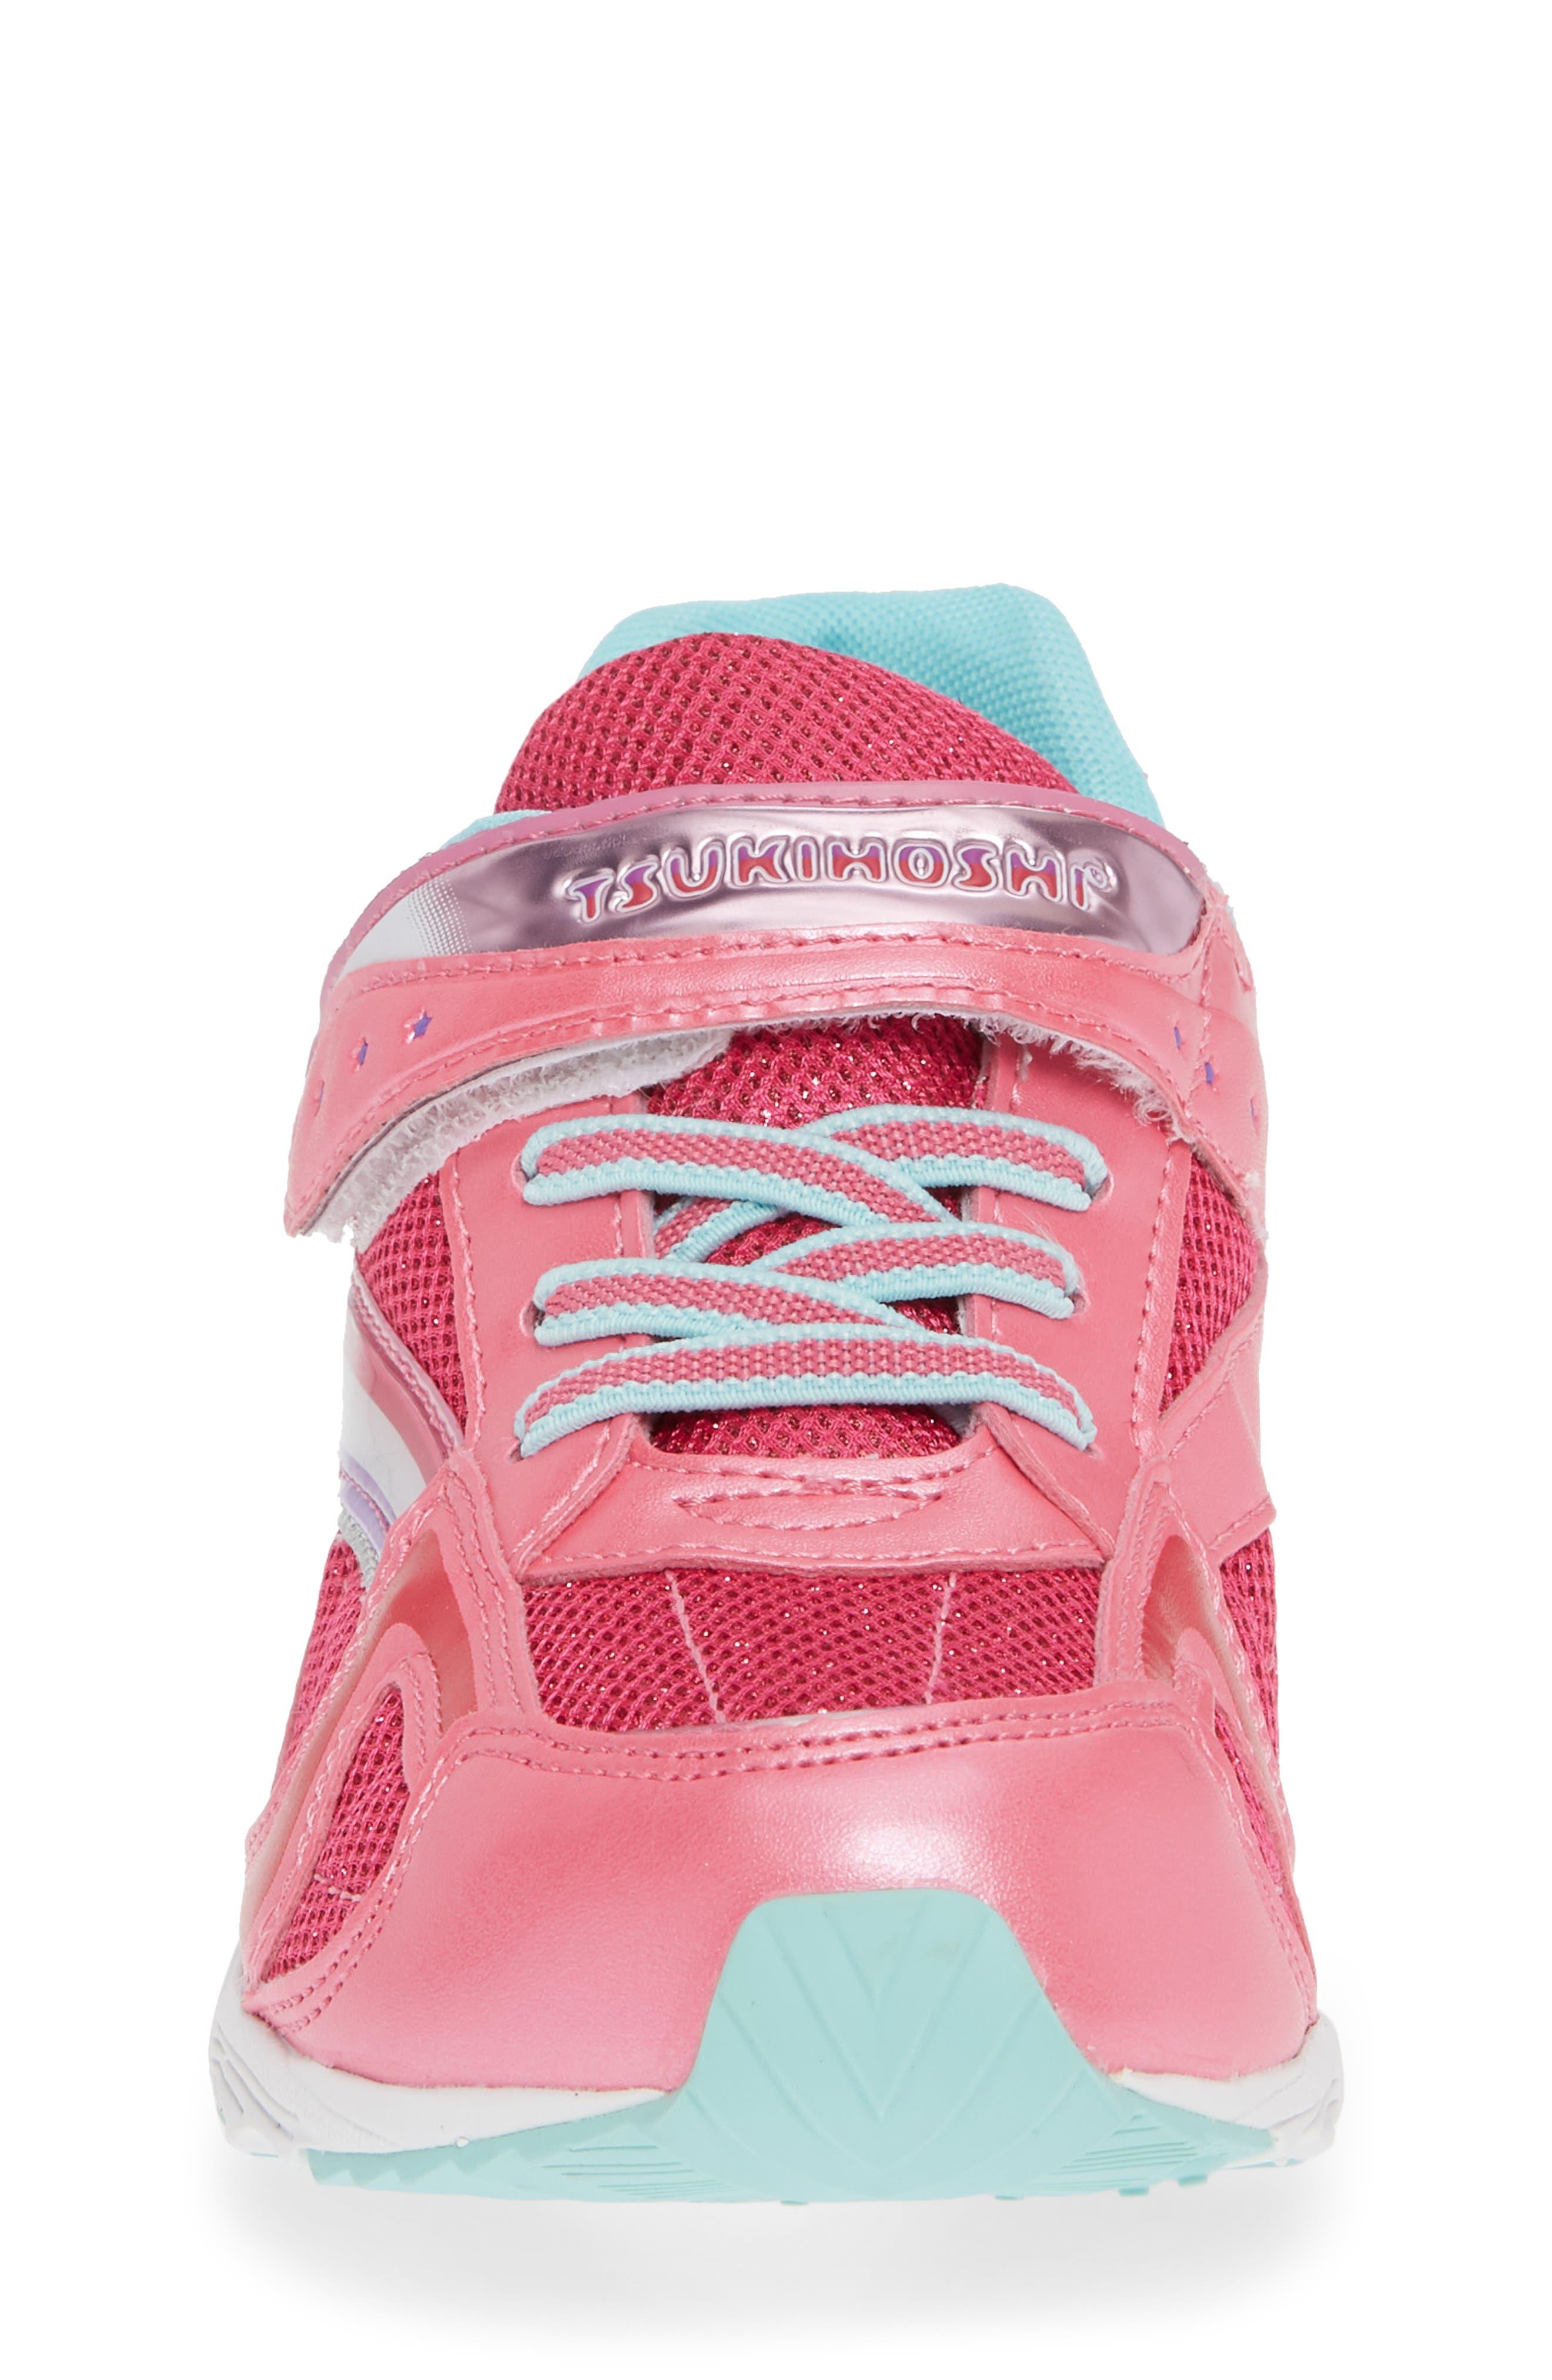 Glitz Washable Sneaker,                             Alternate thumbnail 6, color,                             Hot Pink/ Mint